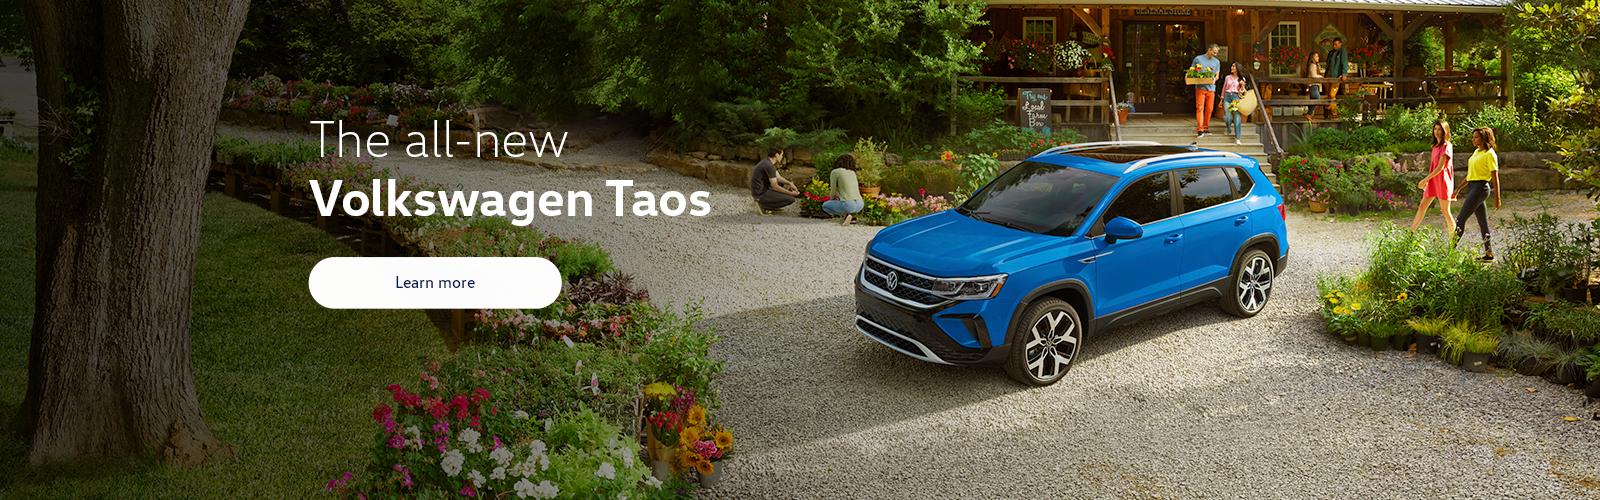 All new Volkswagen Taos